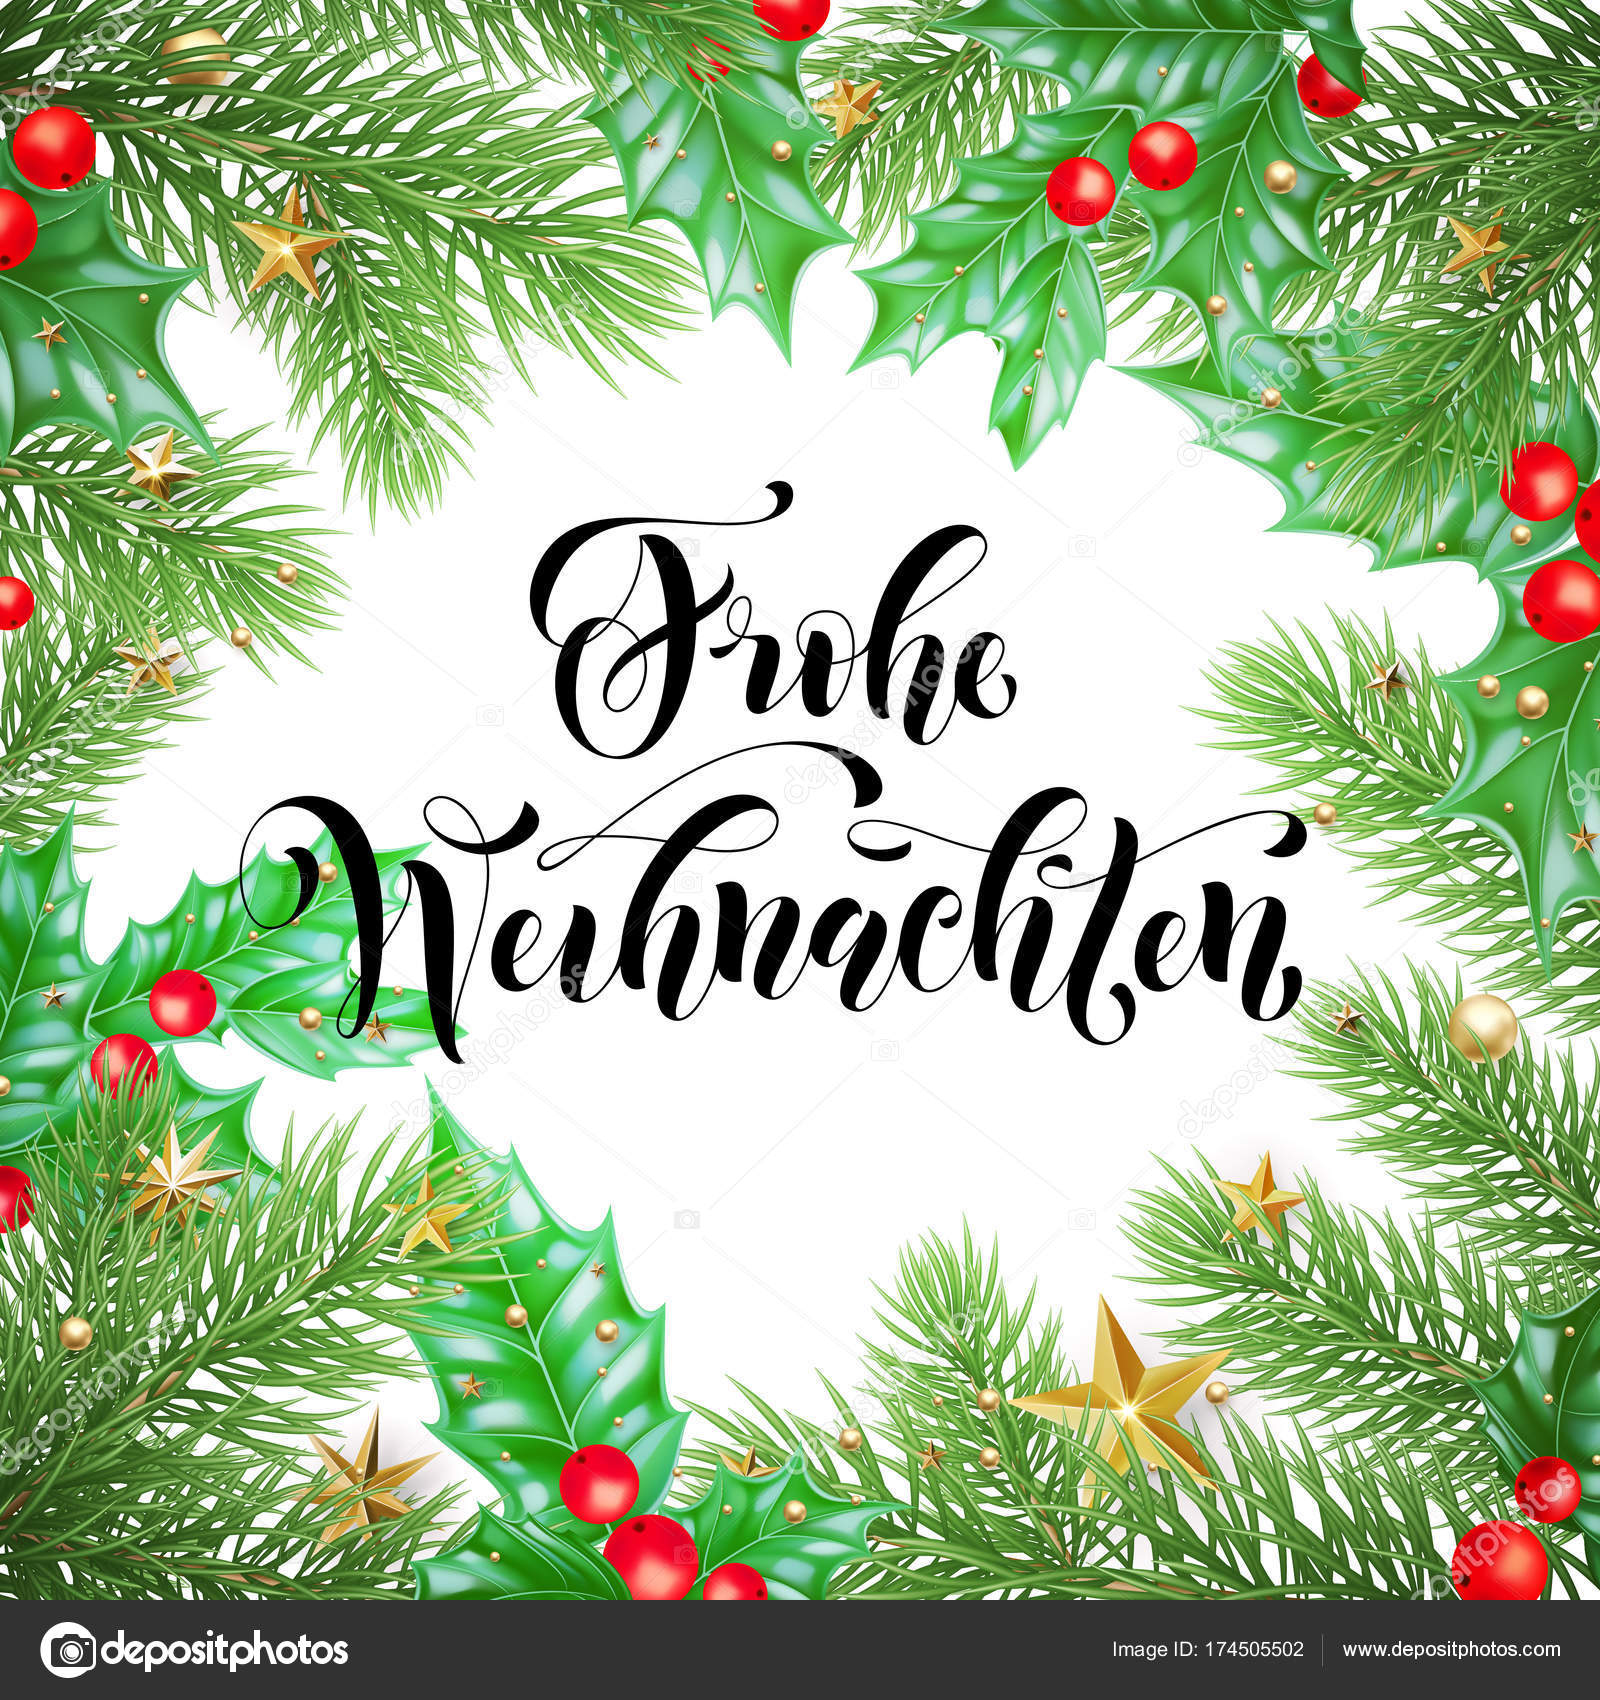 Frohe Weihnachten German Merry Christmas hand drawn quote ...